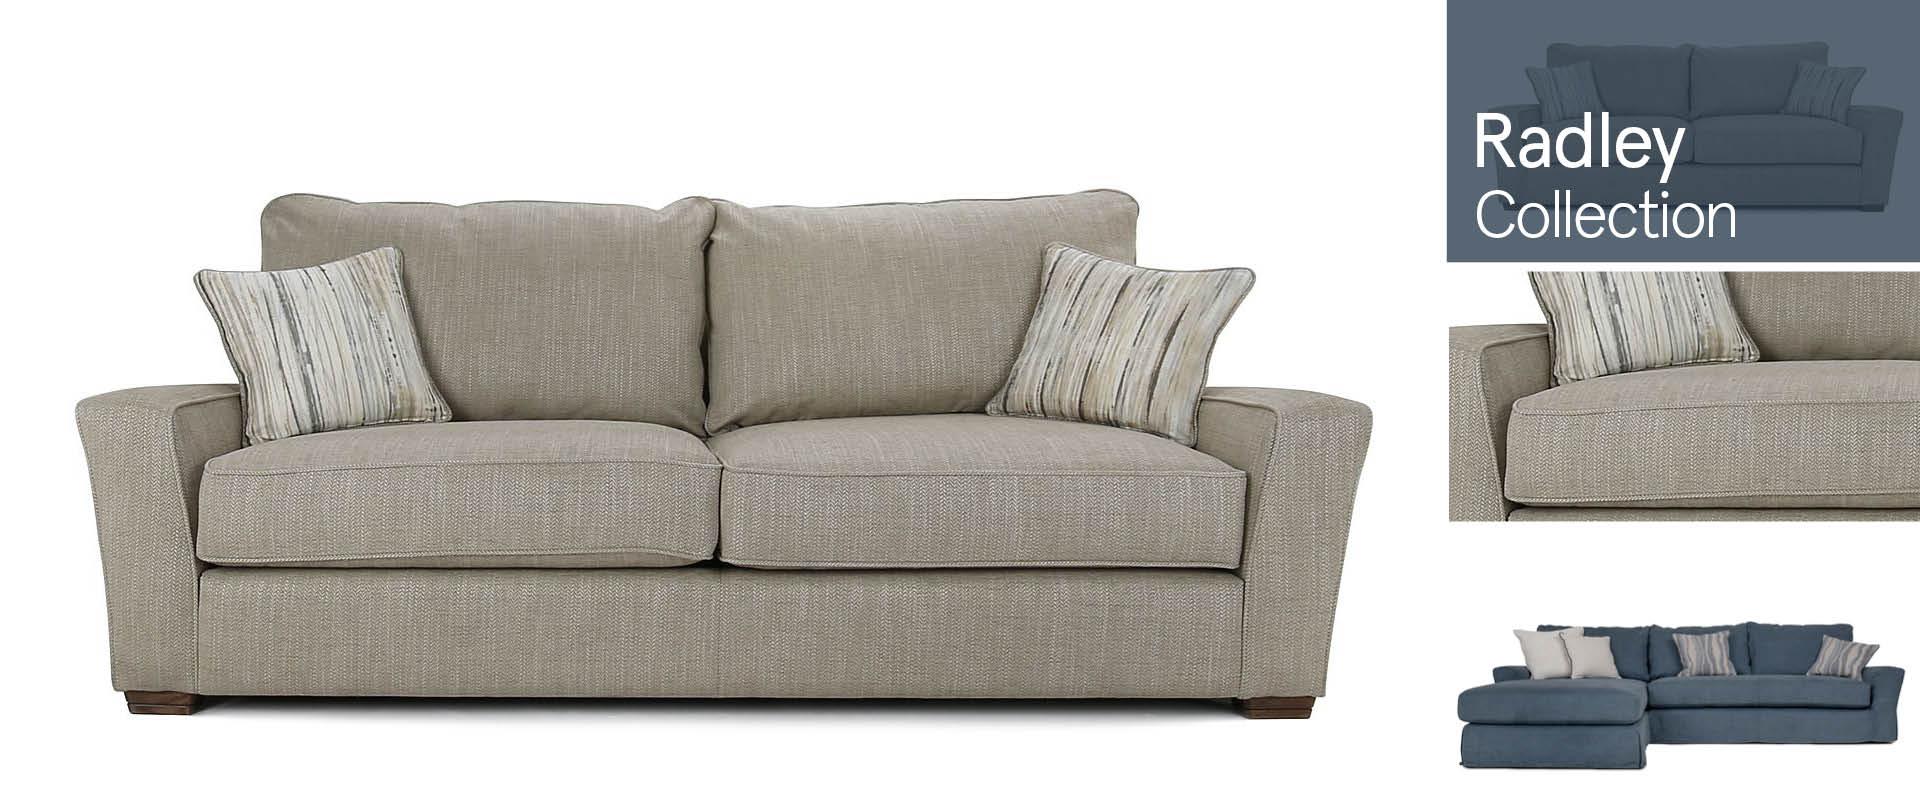 Radley All Fabric Sofa Ranges